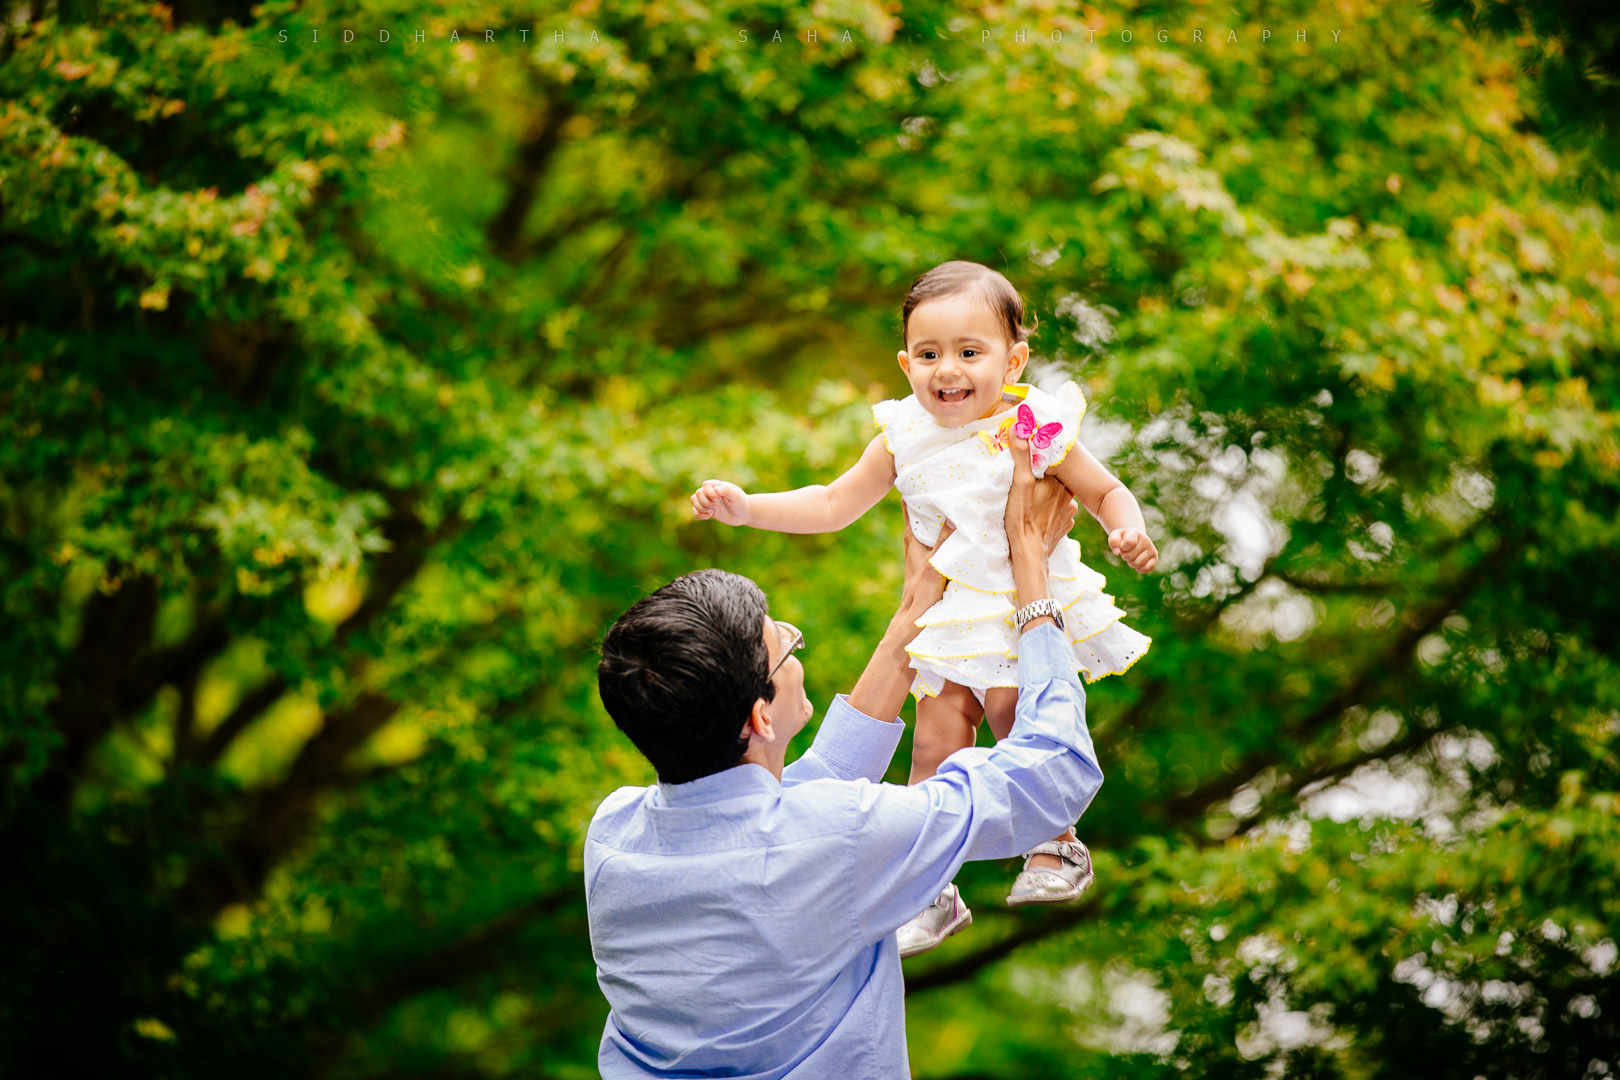 2015-08-08 - Padmaja Ketan Family Photoshoot - _05Y8579